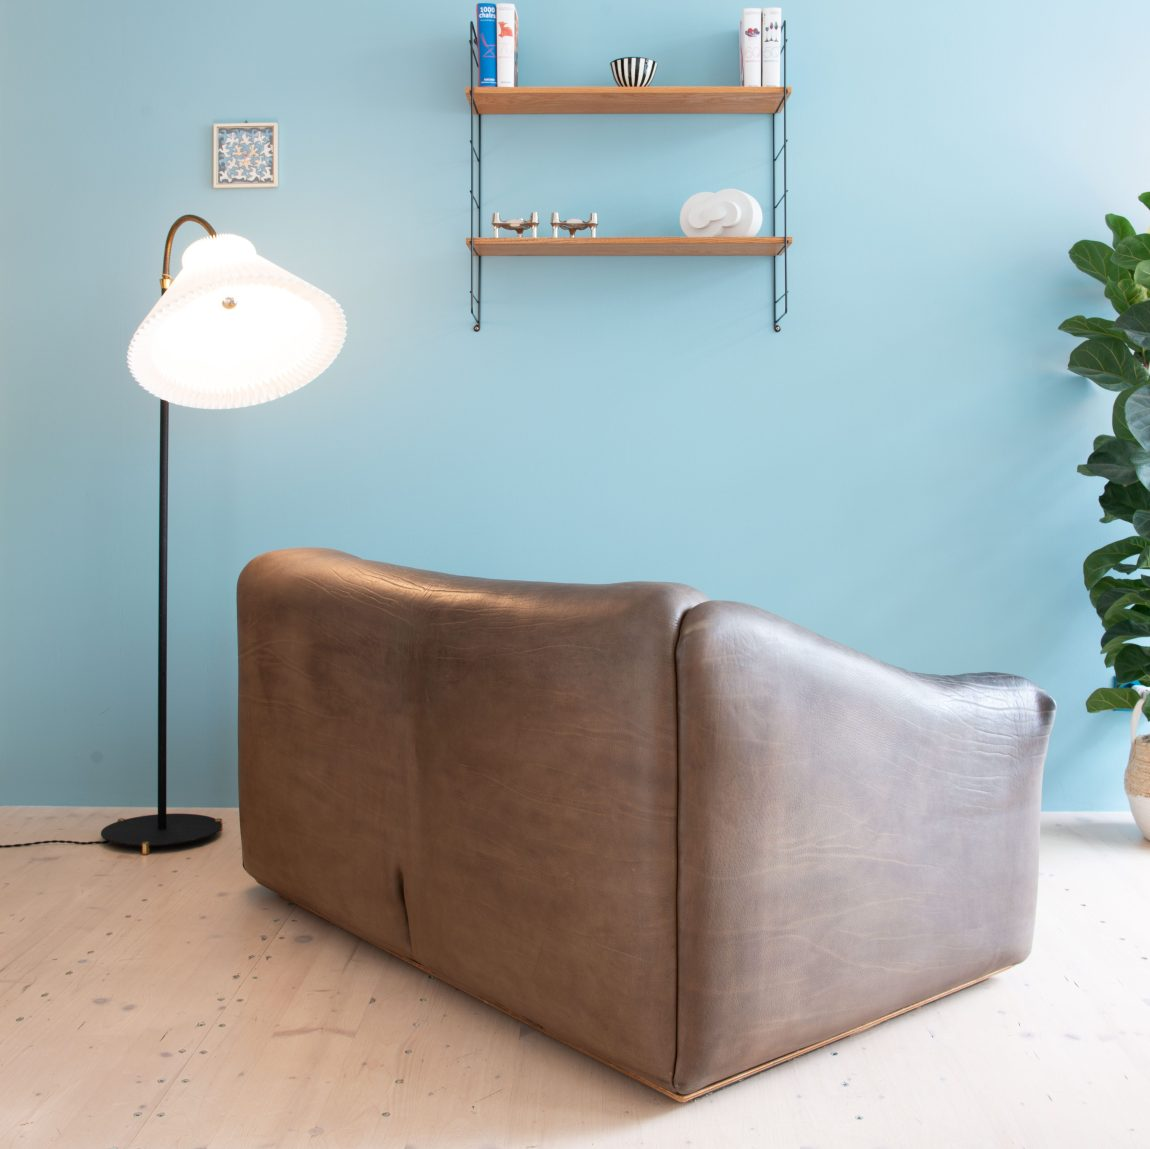 Vintage De Sede Sofa in Buffalo Leather. Classic Swiss Design. Available at heyday möbel, Grubenstrasse 19, 8045 Zürich, Switzerland. Mid-century modern.